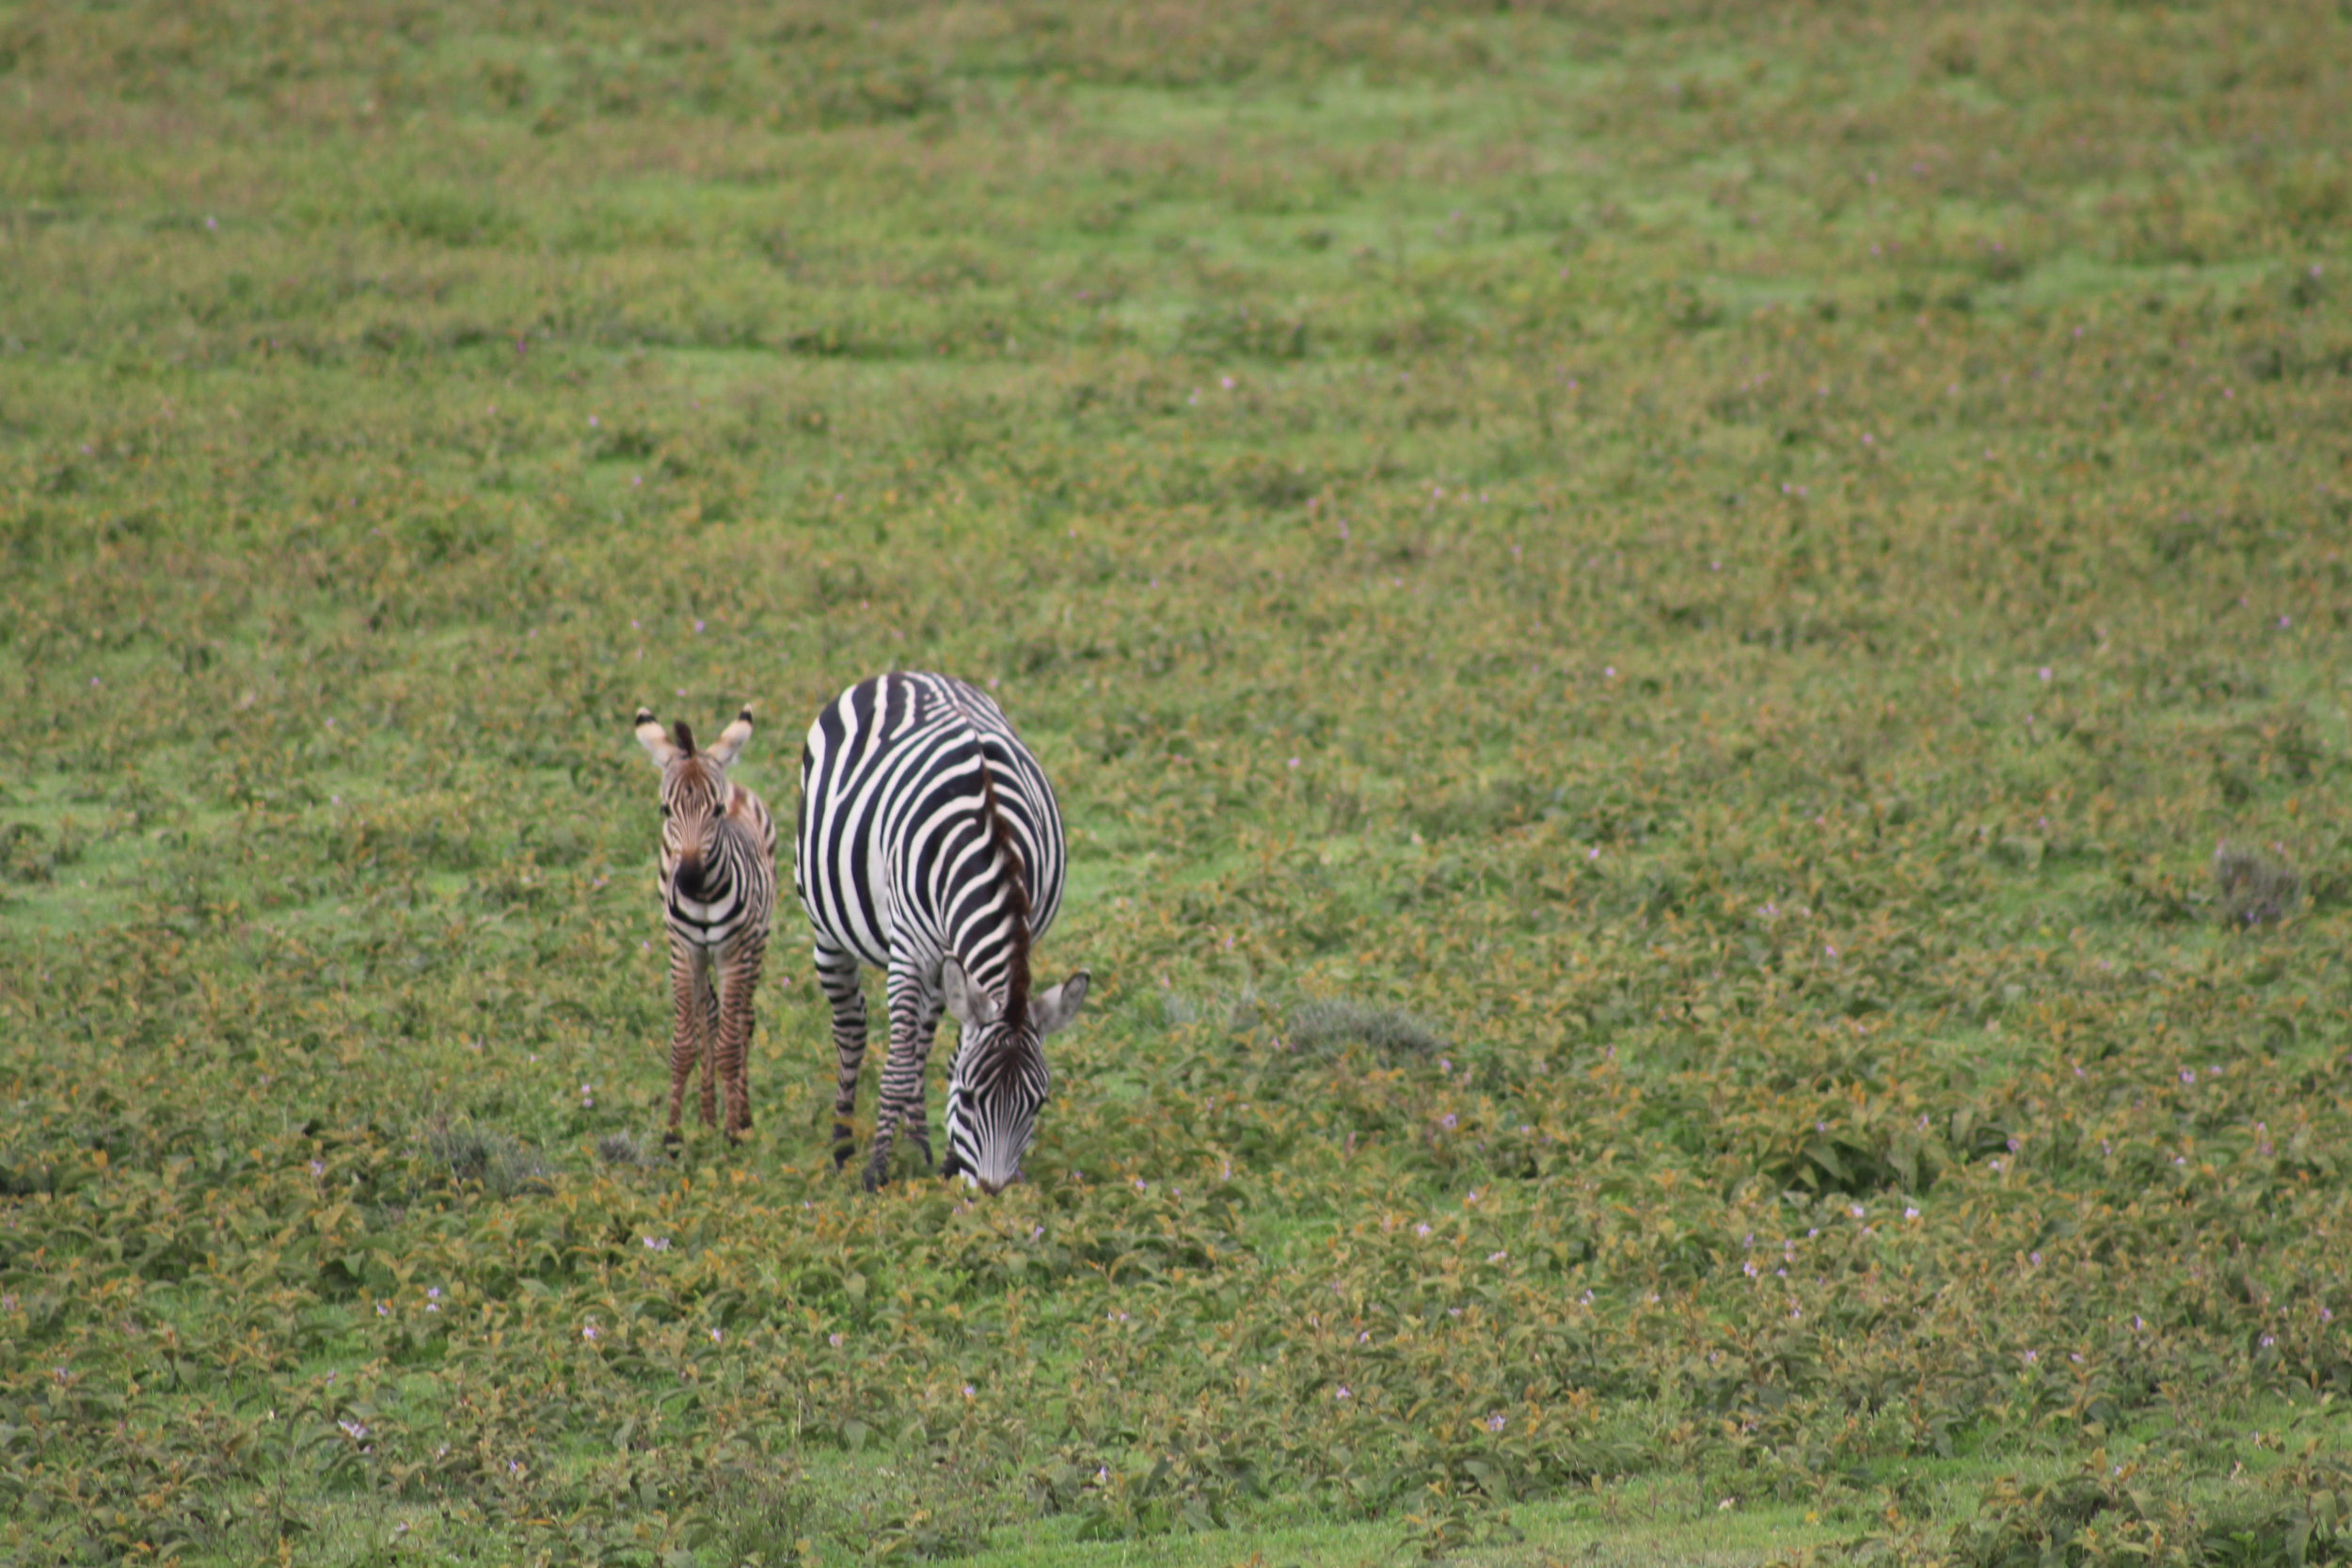 Baby zebra and mom in Tanzania